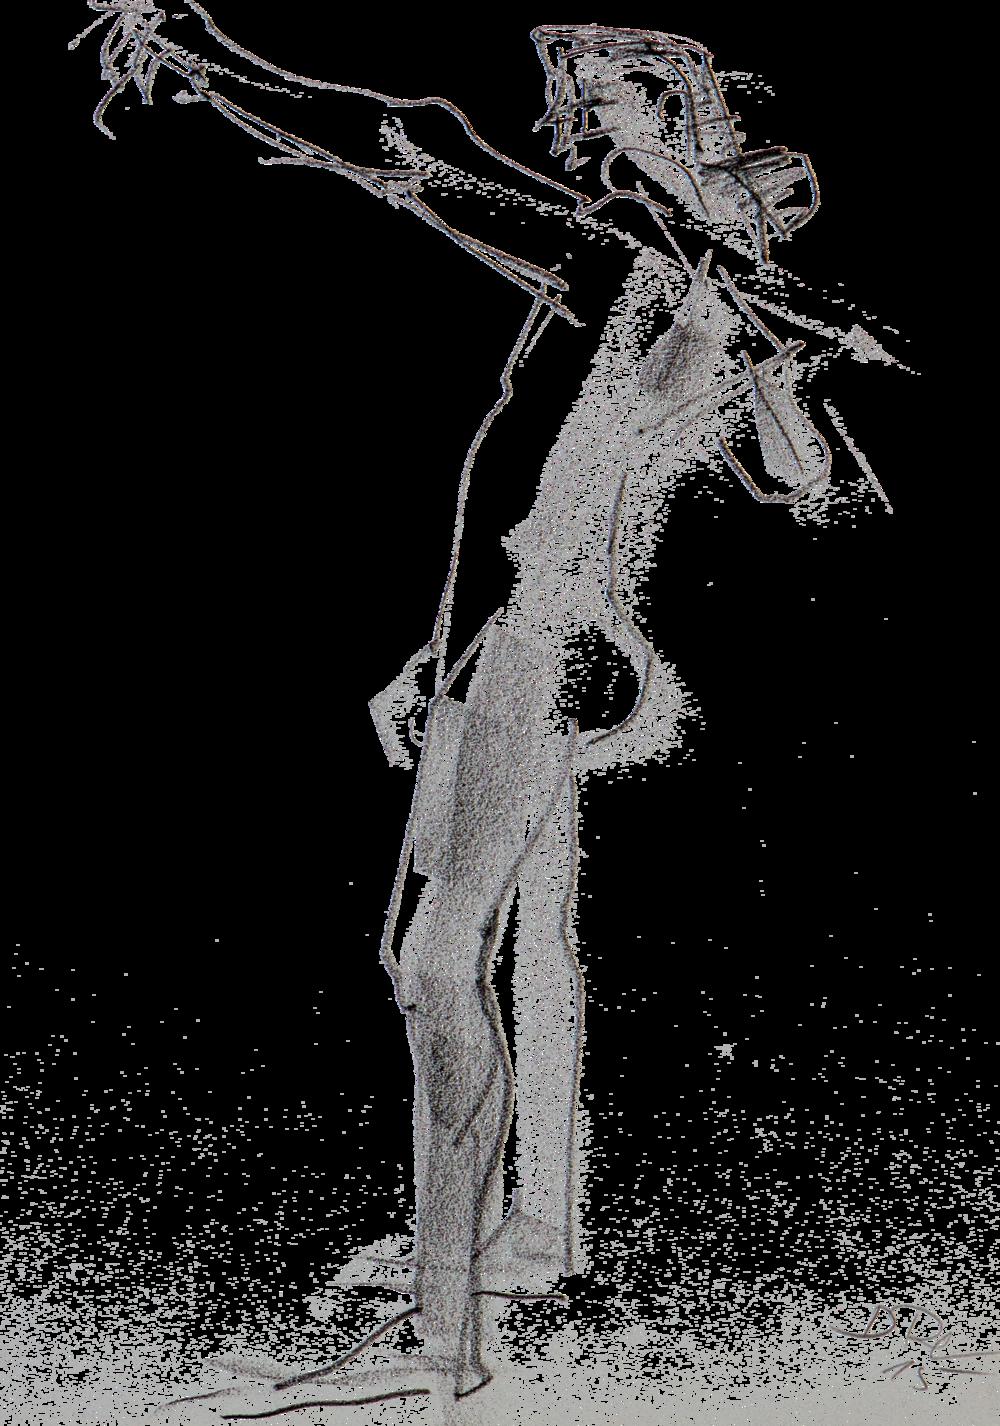 DRL-AktSkizzen-Katalog2016-8337.png